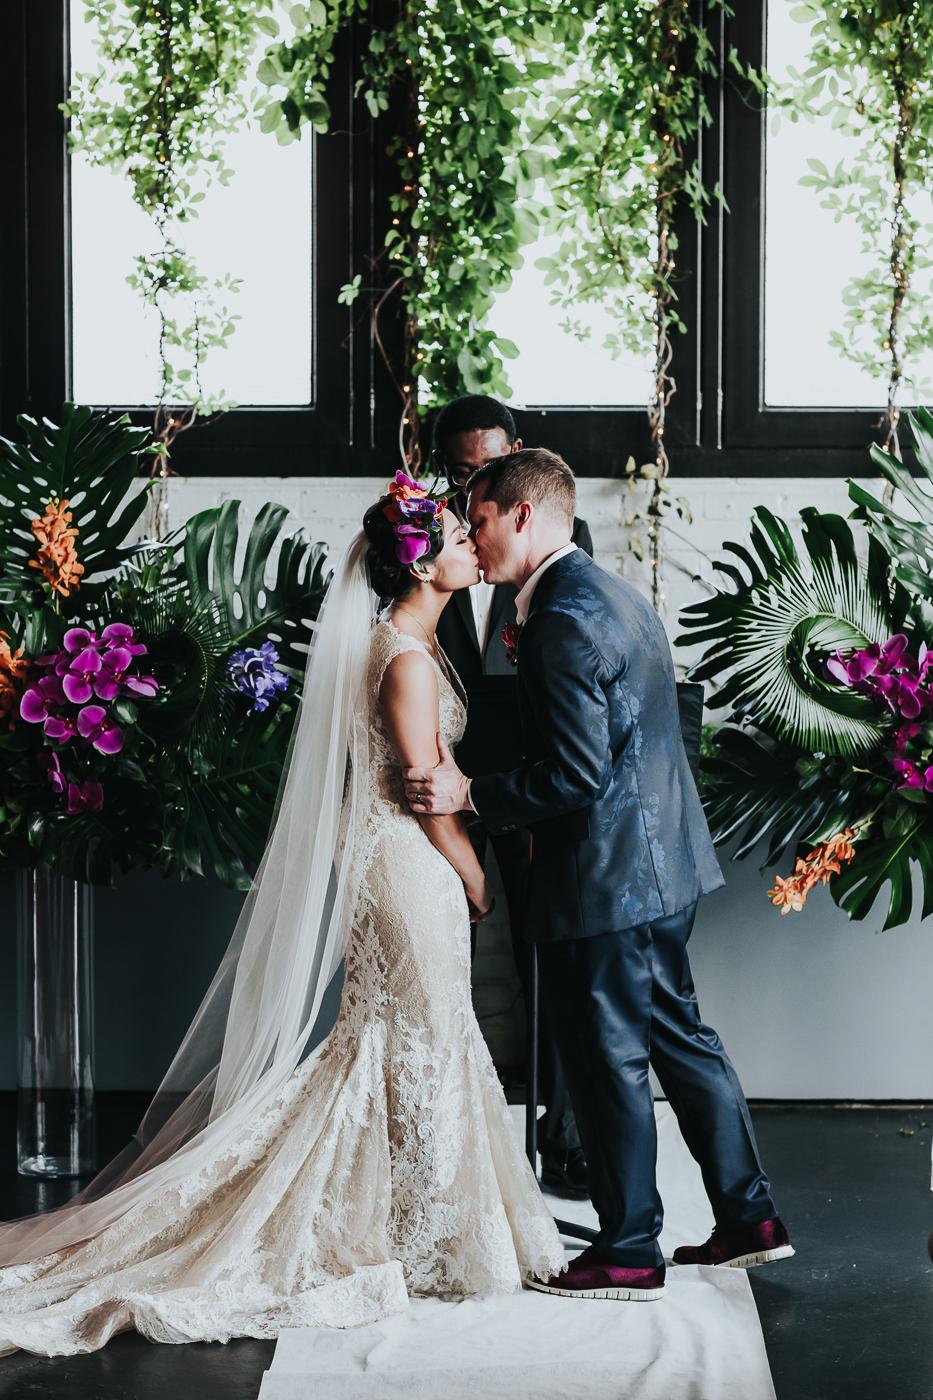 501-Union-Brooklyn-Documentary-Wedding-Photographer-78.jpg